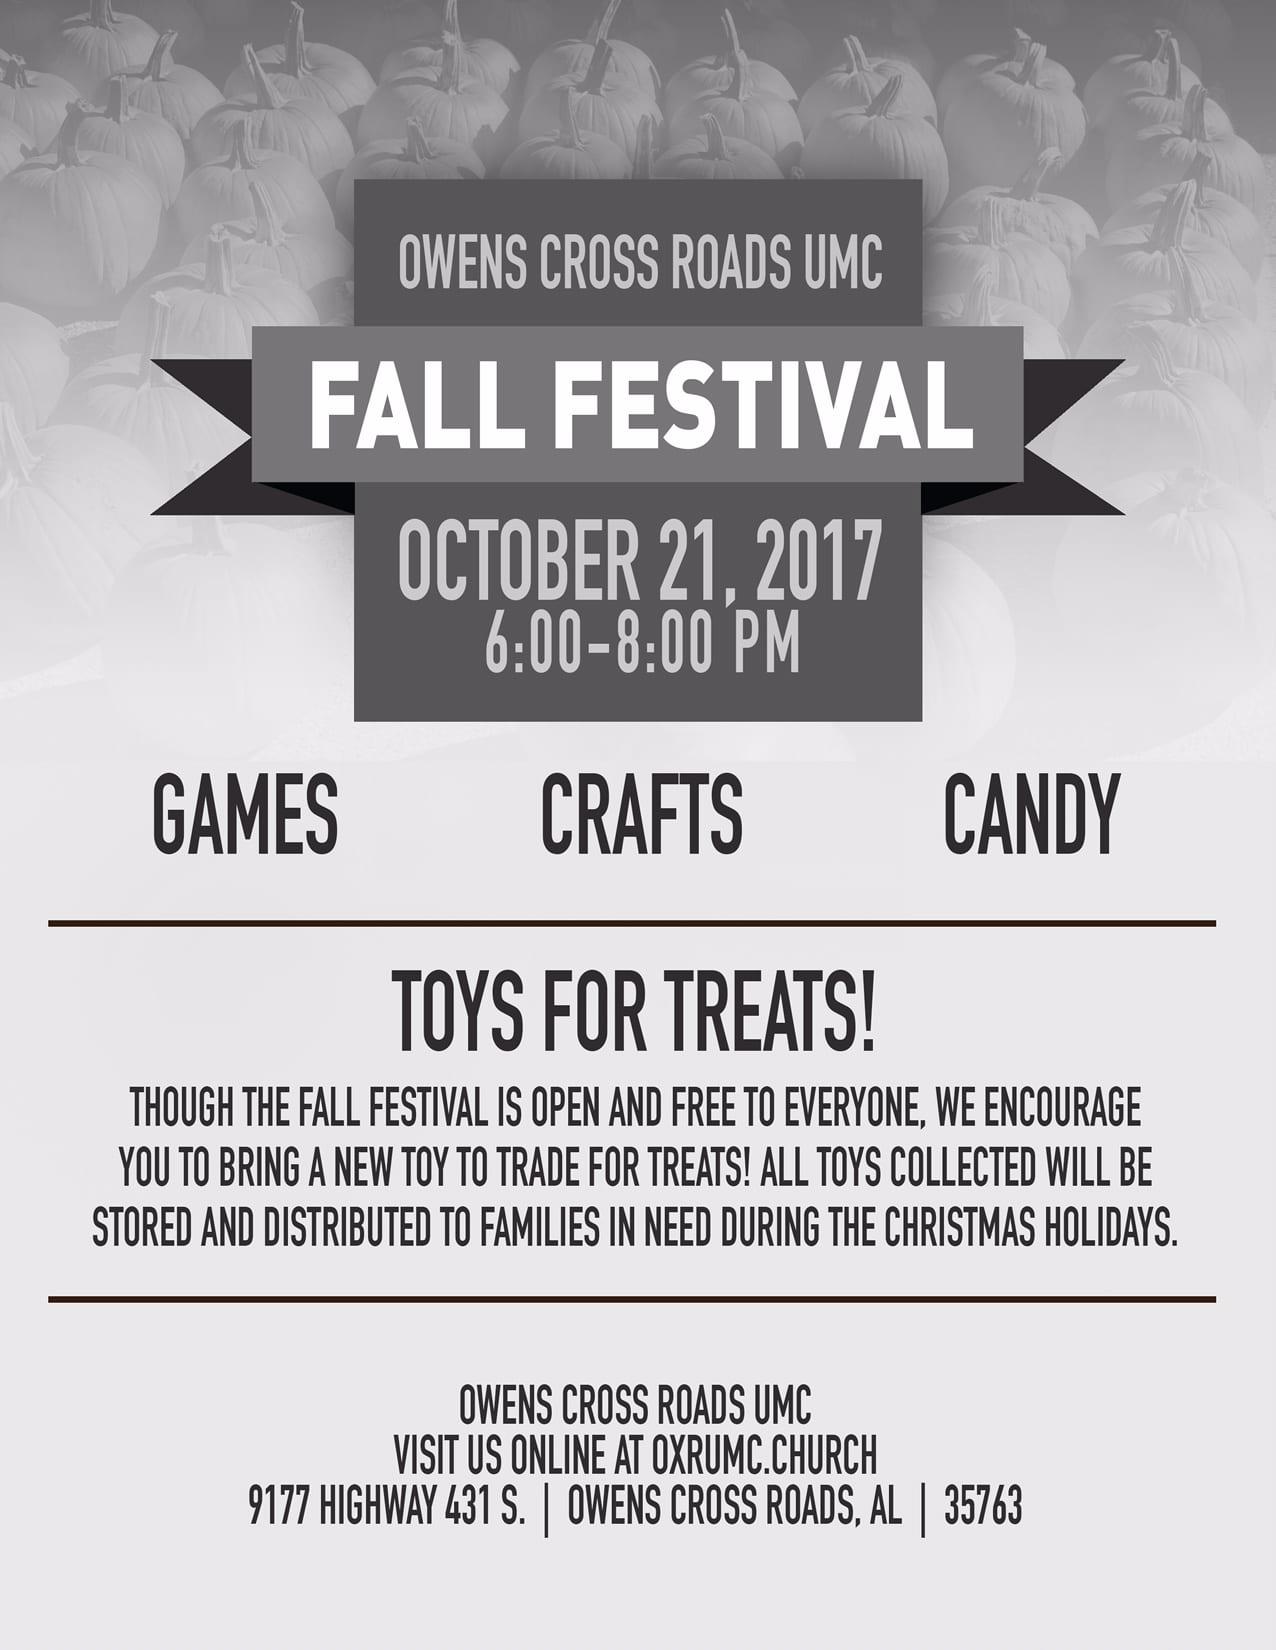 Fall Festival & Toys for Treats at Owens Cross Roads UMC